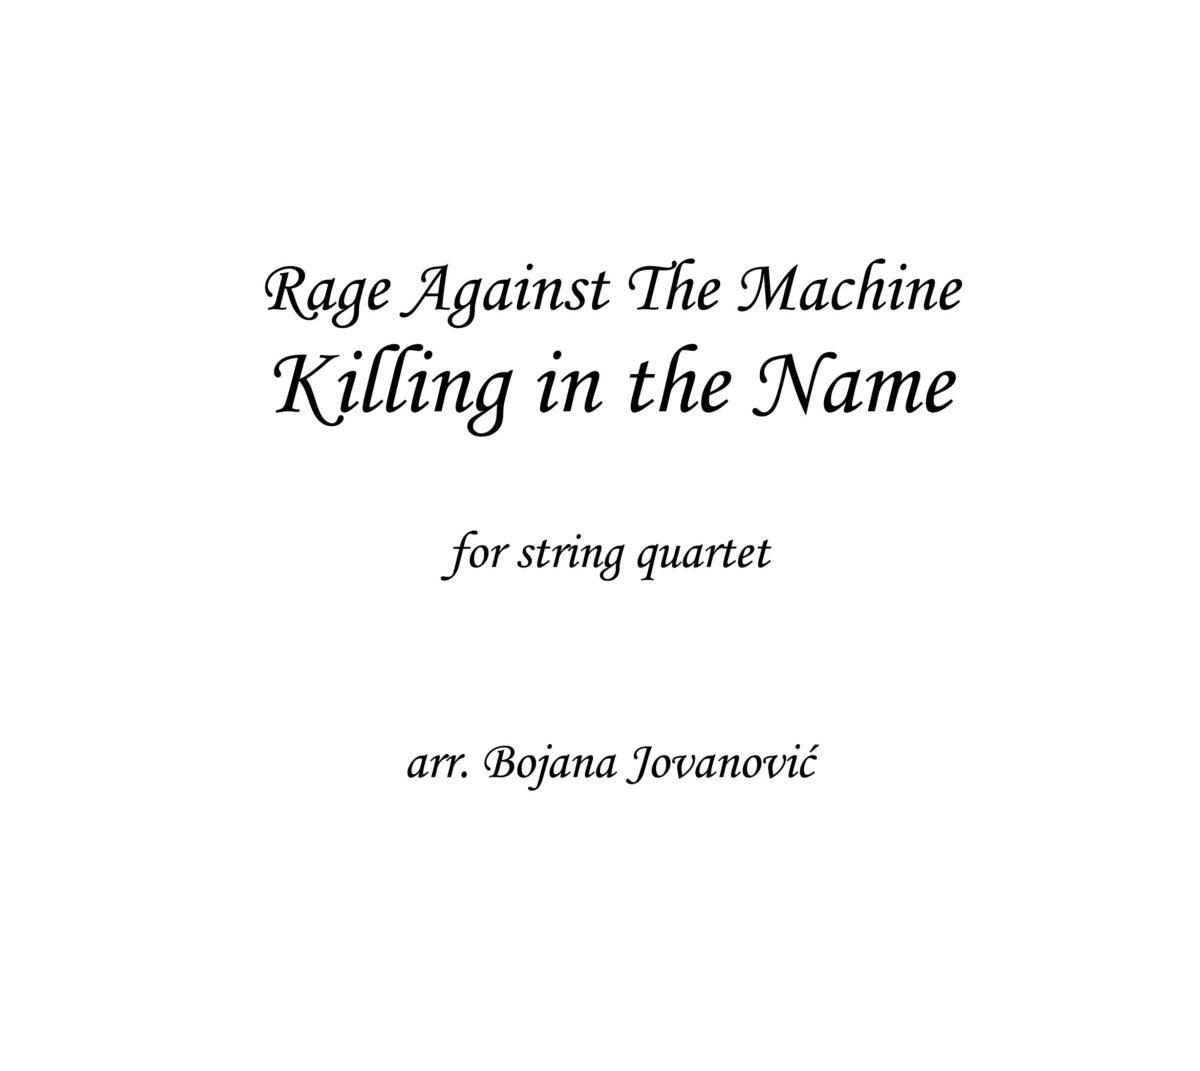 Killing in the name (RATM) - Sheet Music